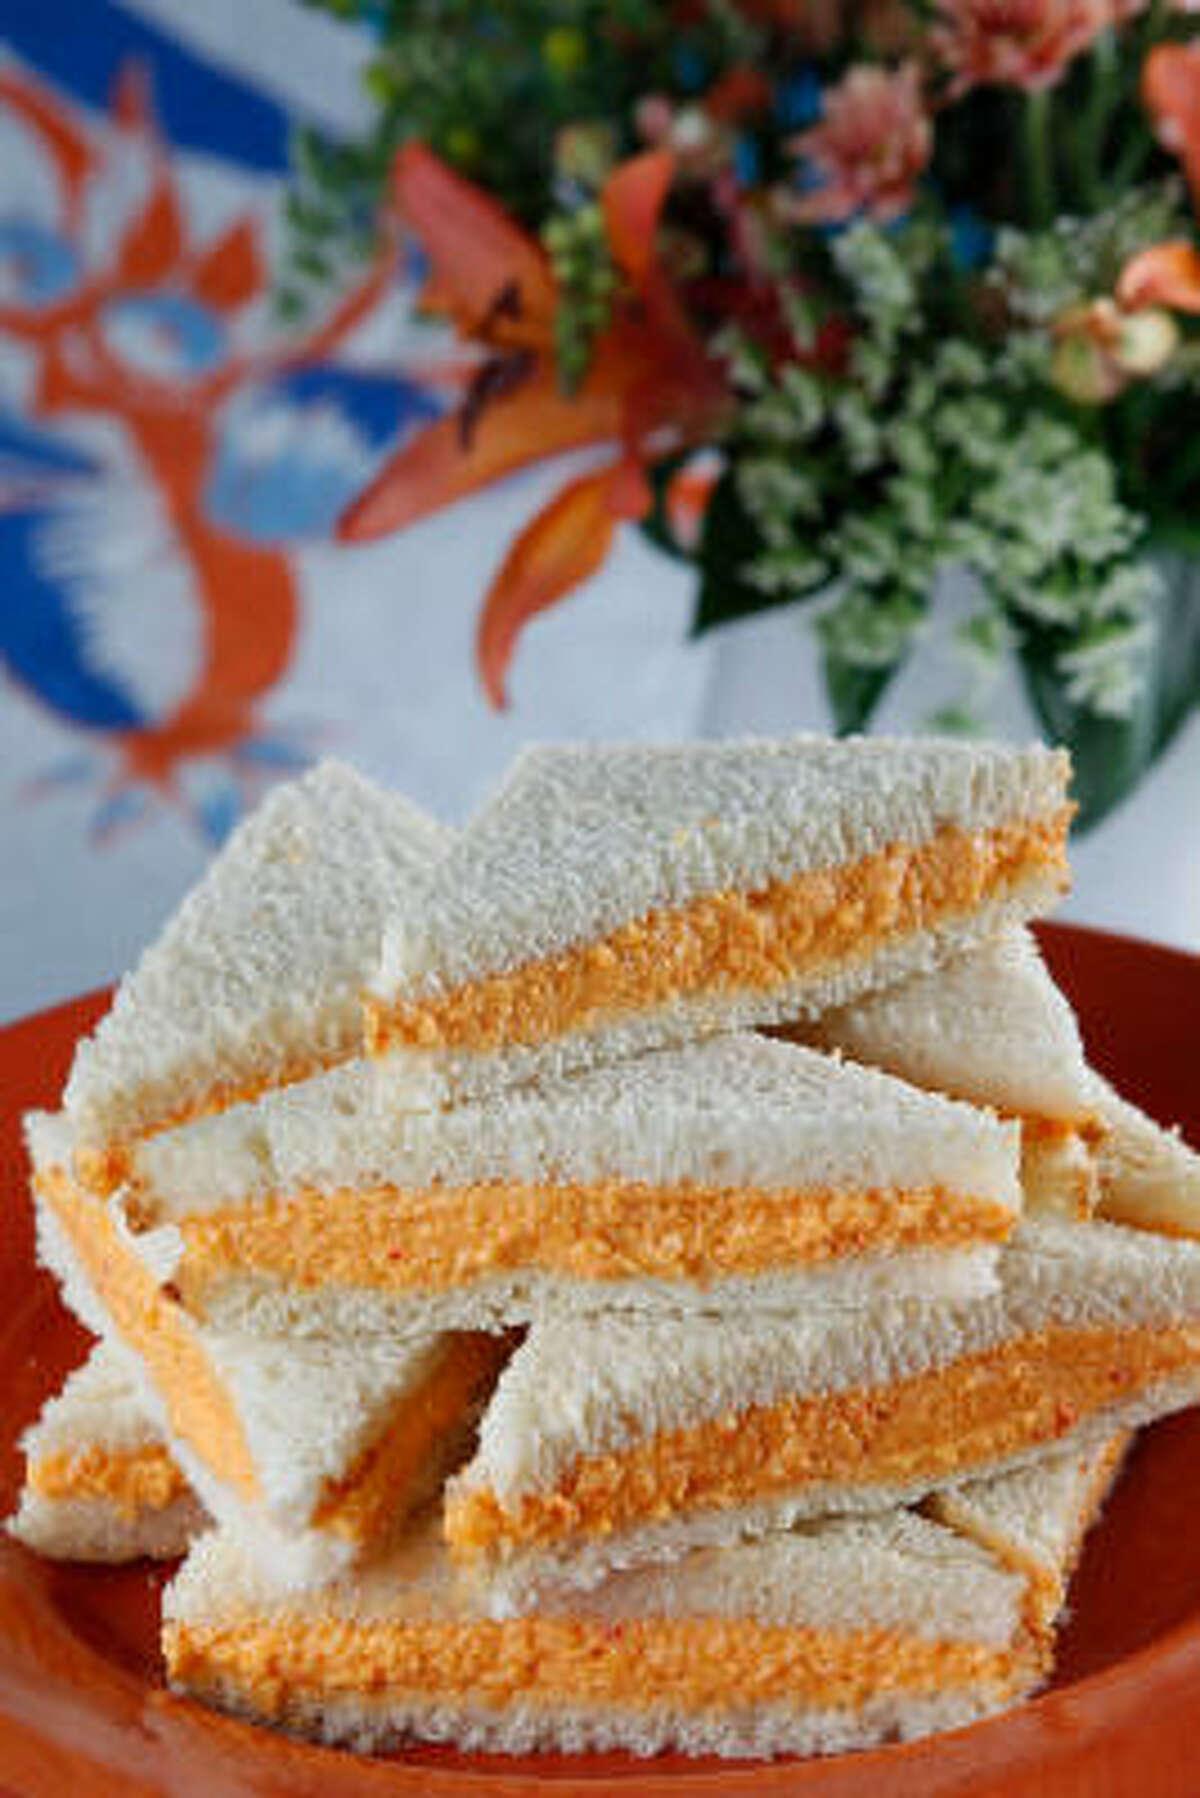 Blue-Ribbon Pimento Cheese sandwiches